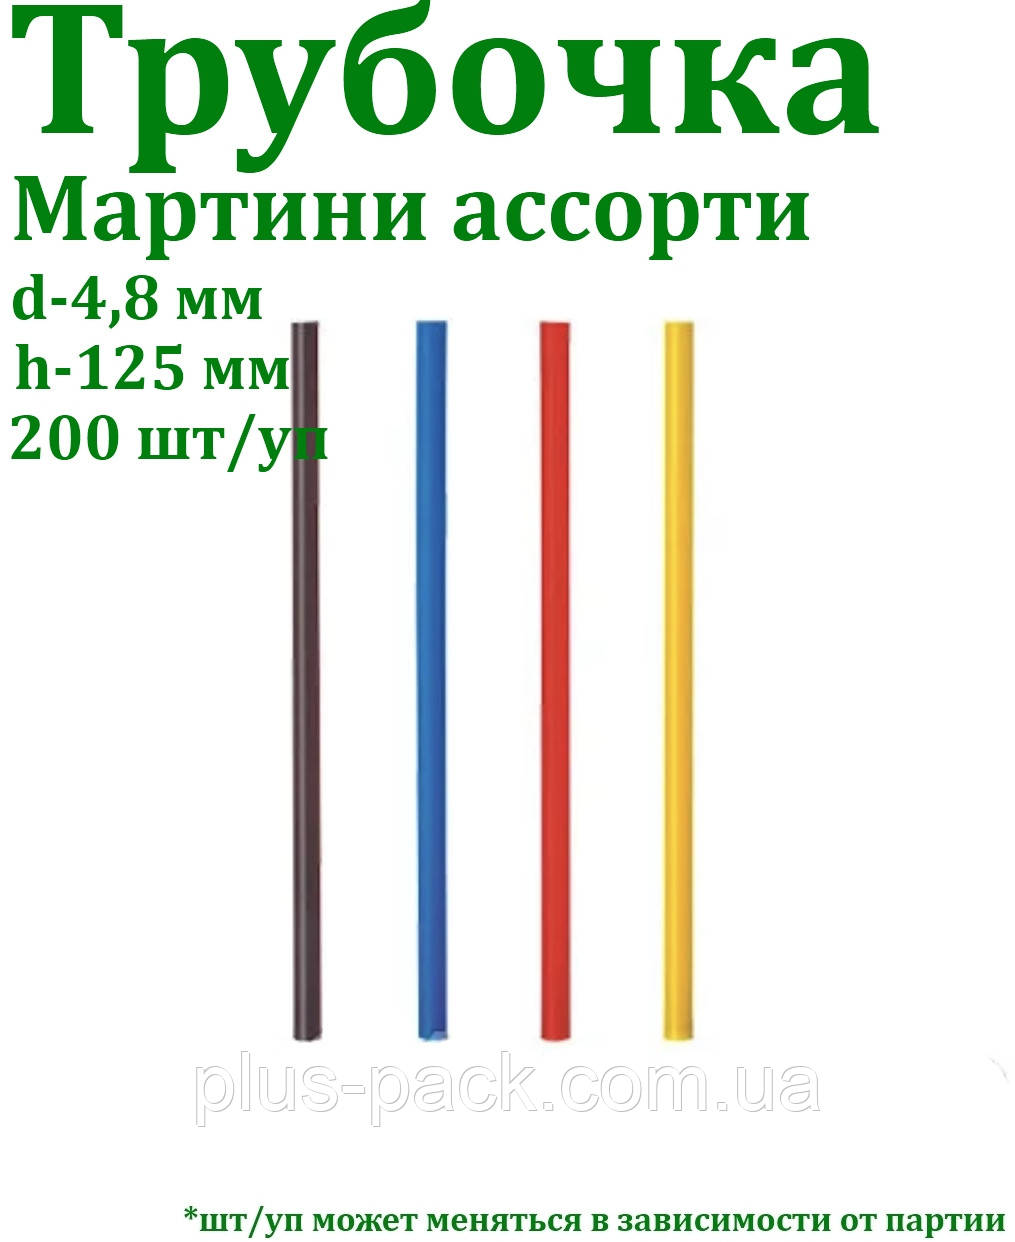 "Трубочка-соломка для напитков ""Мартини ассорти"""